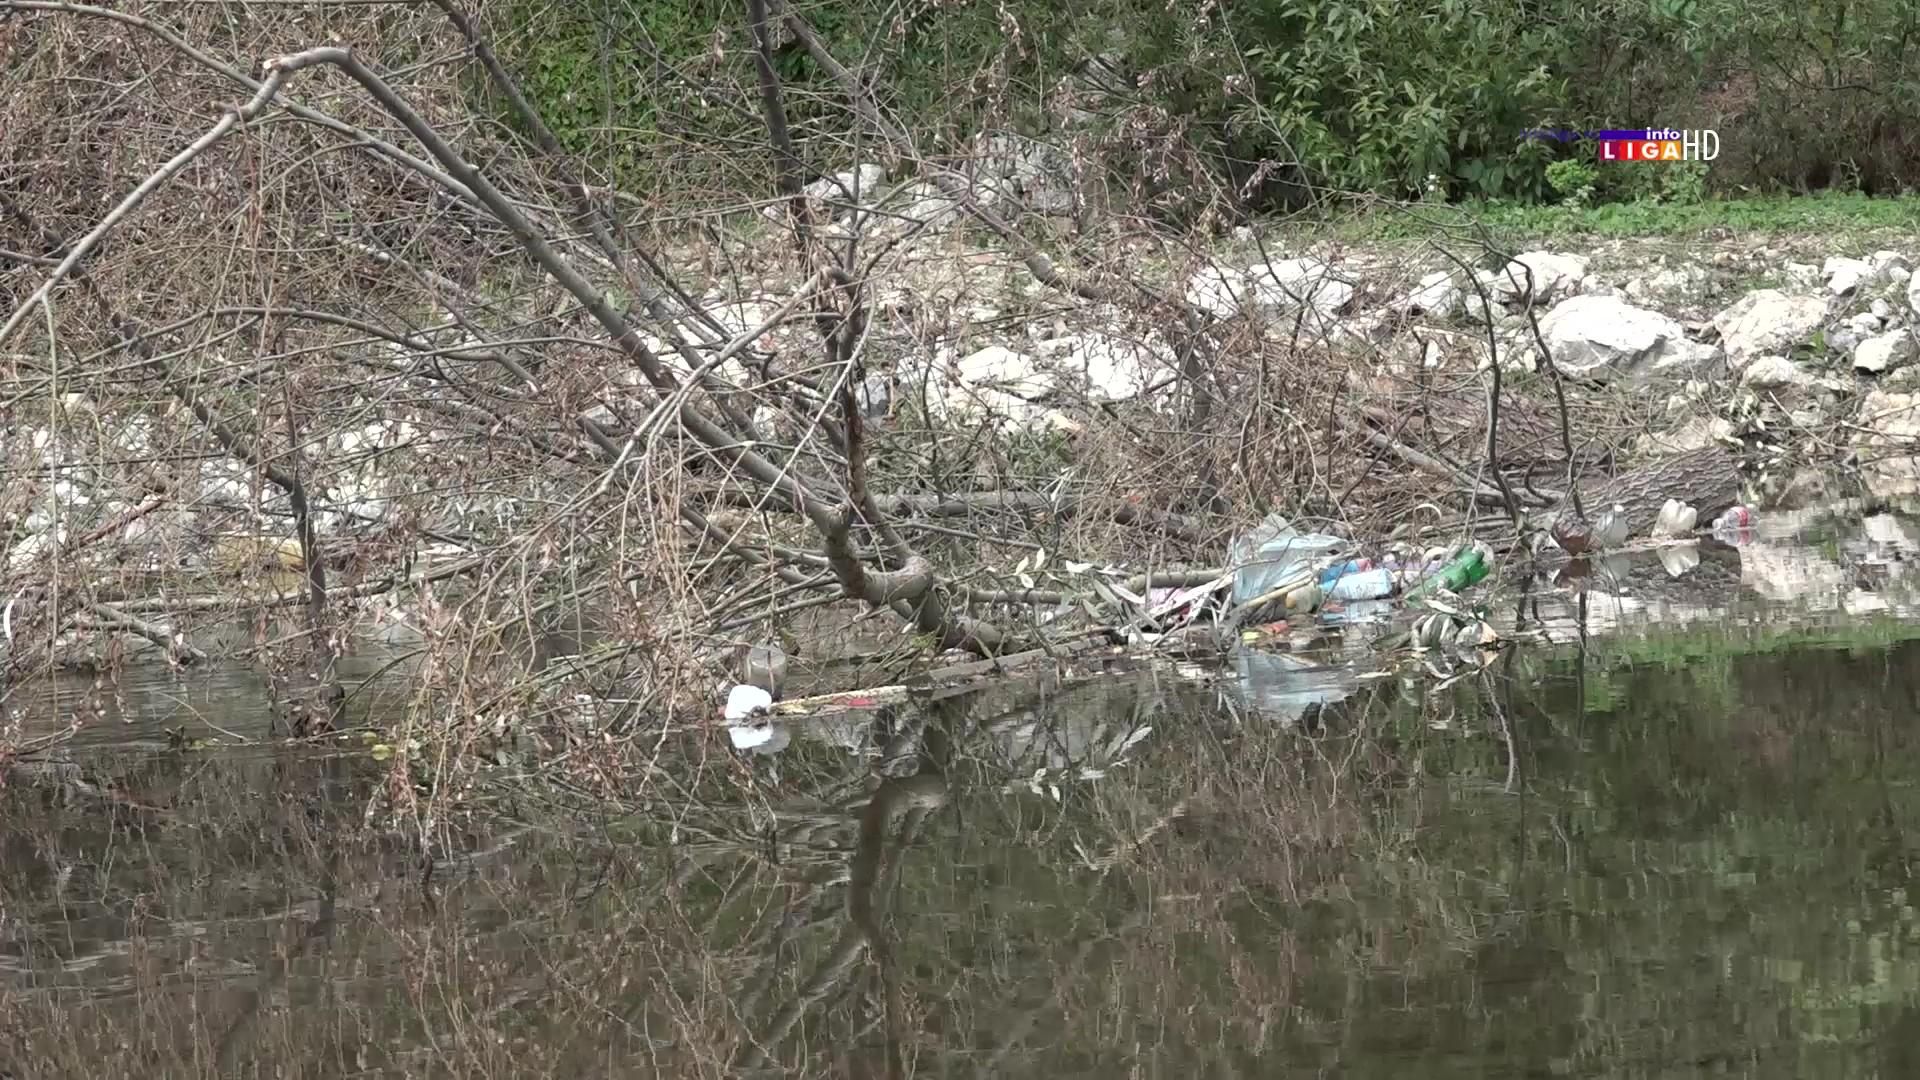 IL-reka-Moravica-2 SKANDALOZNO PONAŠANJE GRAĐANA - Moravicom pluta smeće (VIDEO)